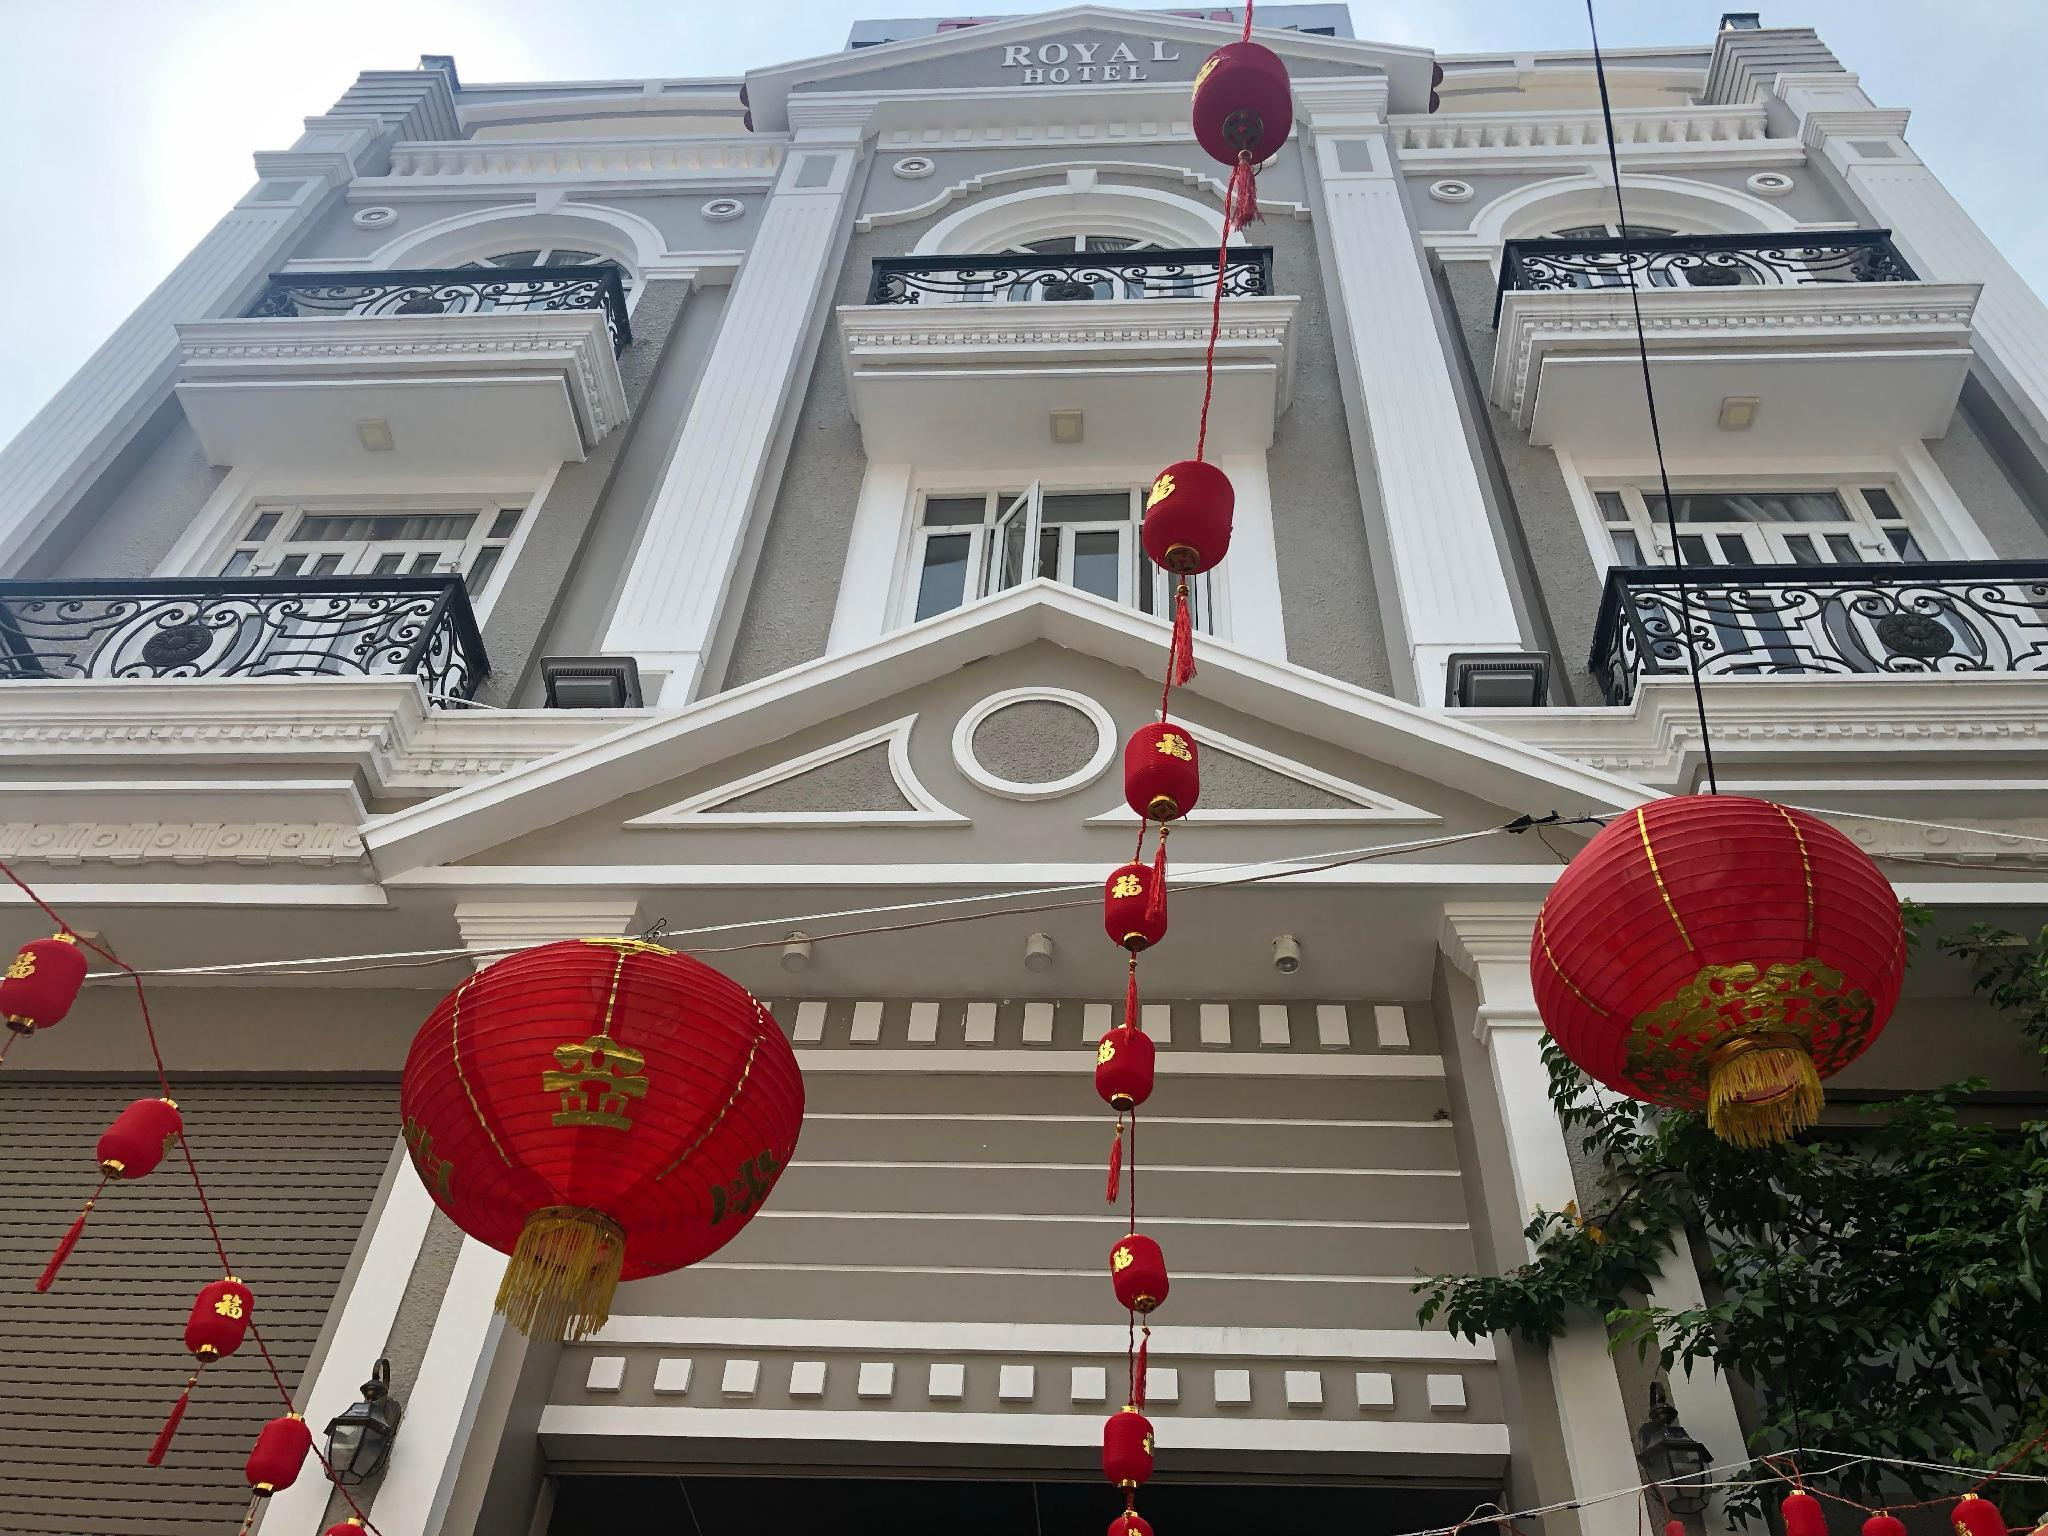 ROYAL HOTEL., Gò Vấp